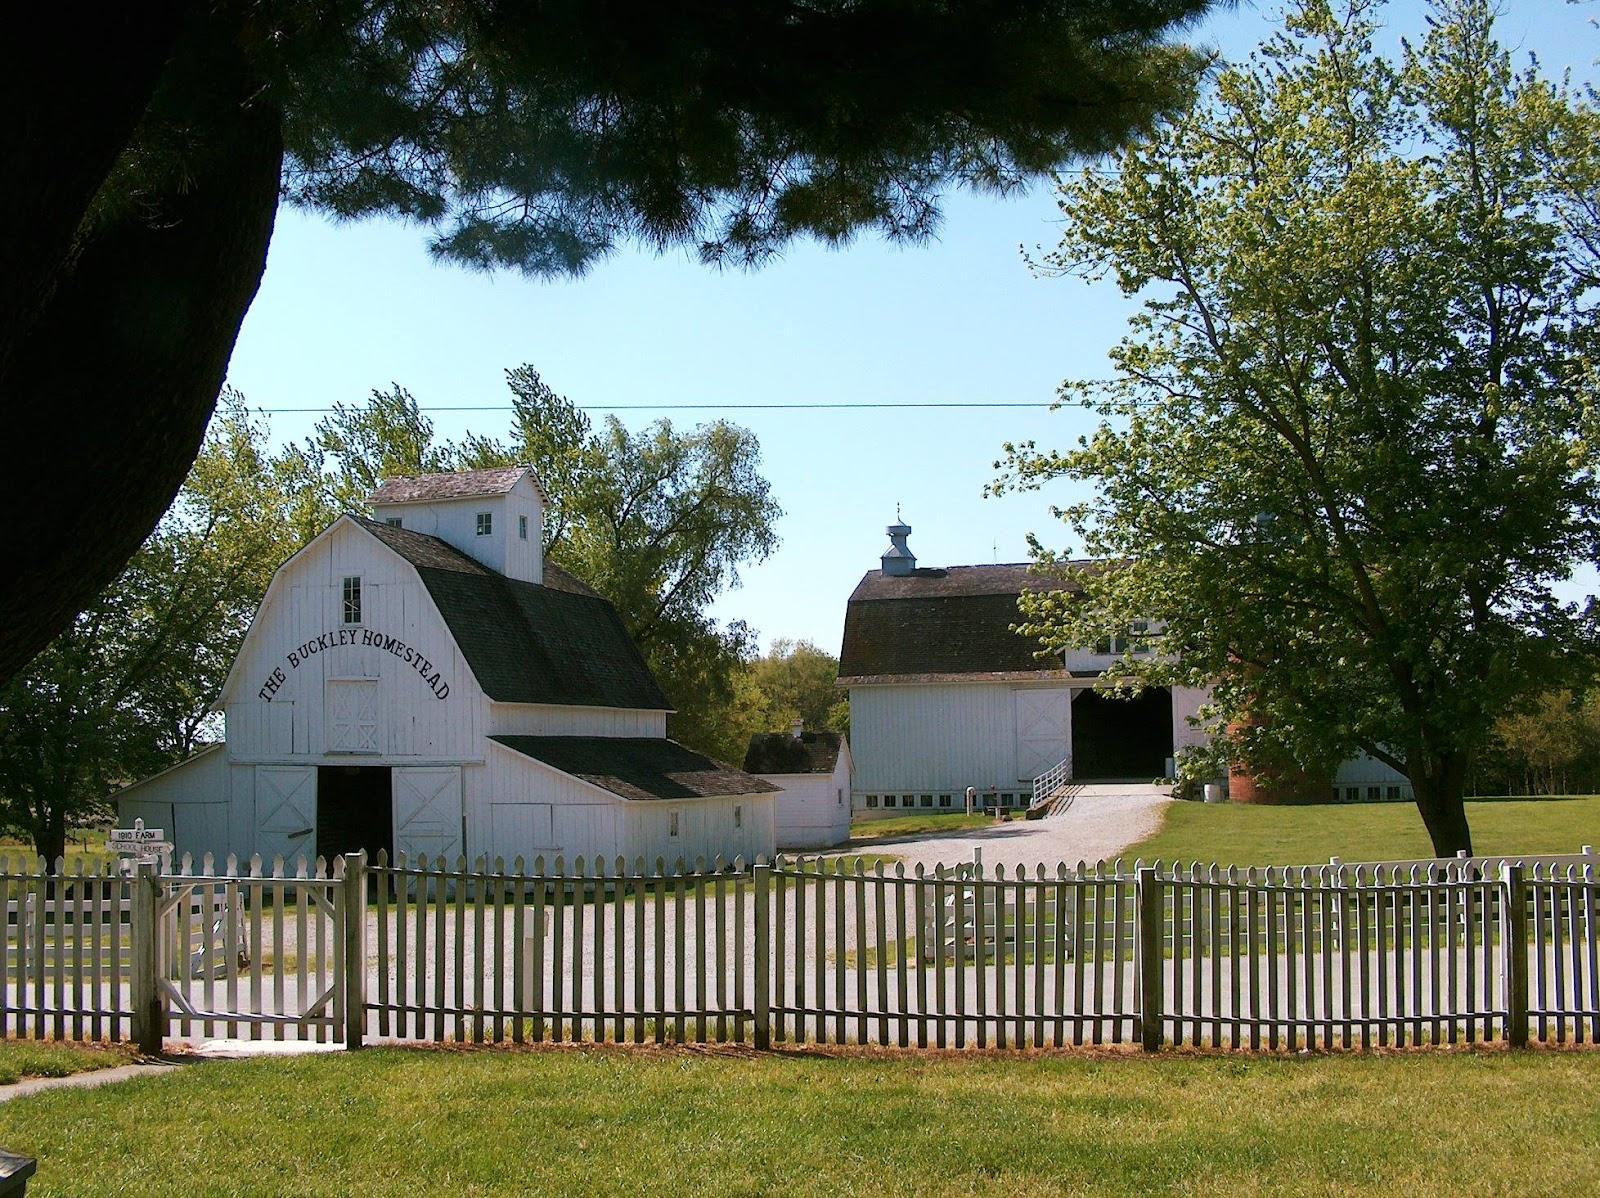 The Buckley Homestead